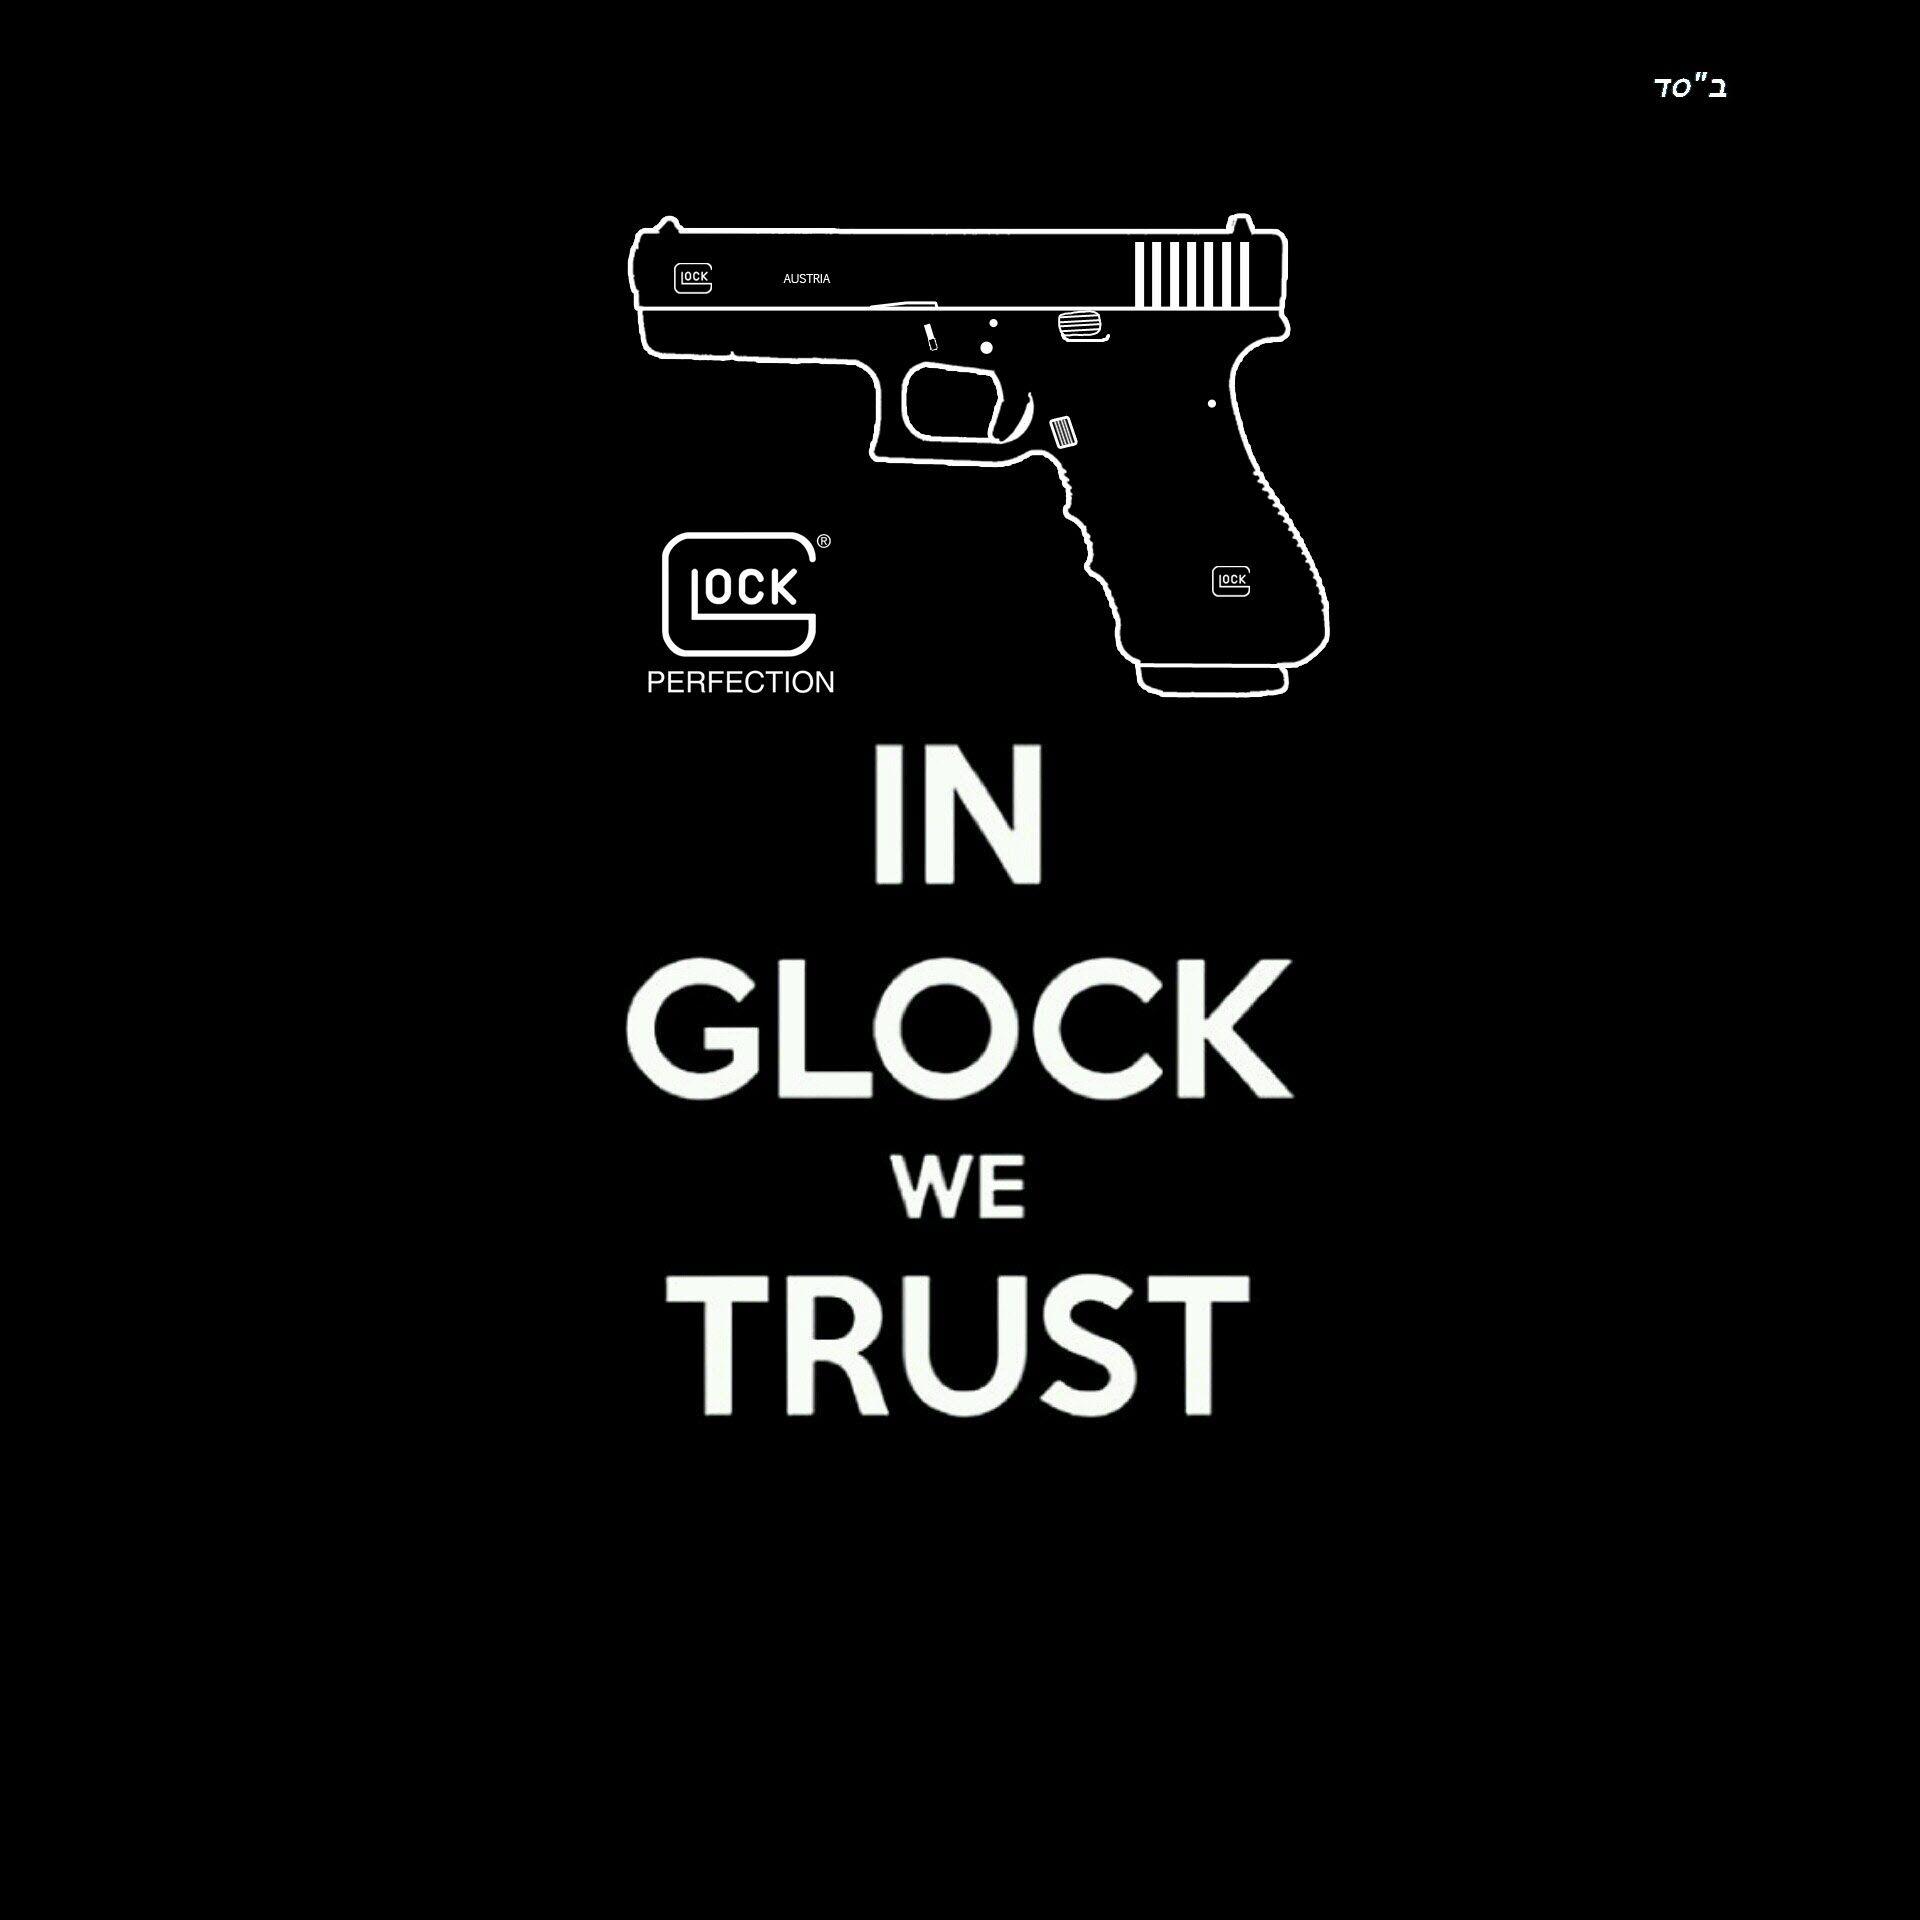 Pin On Glock Pic